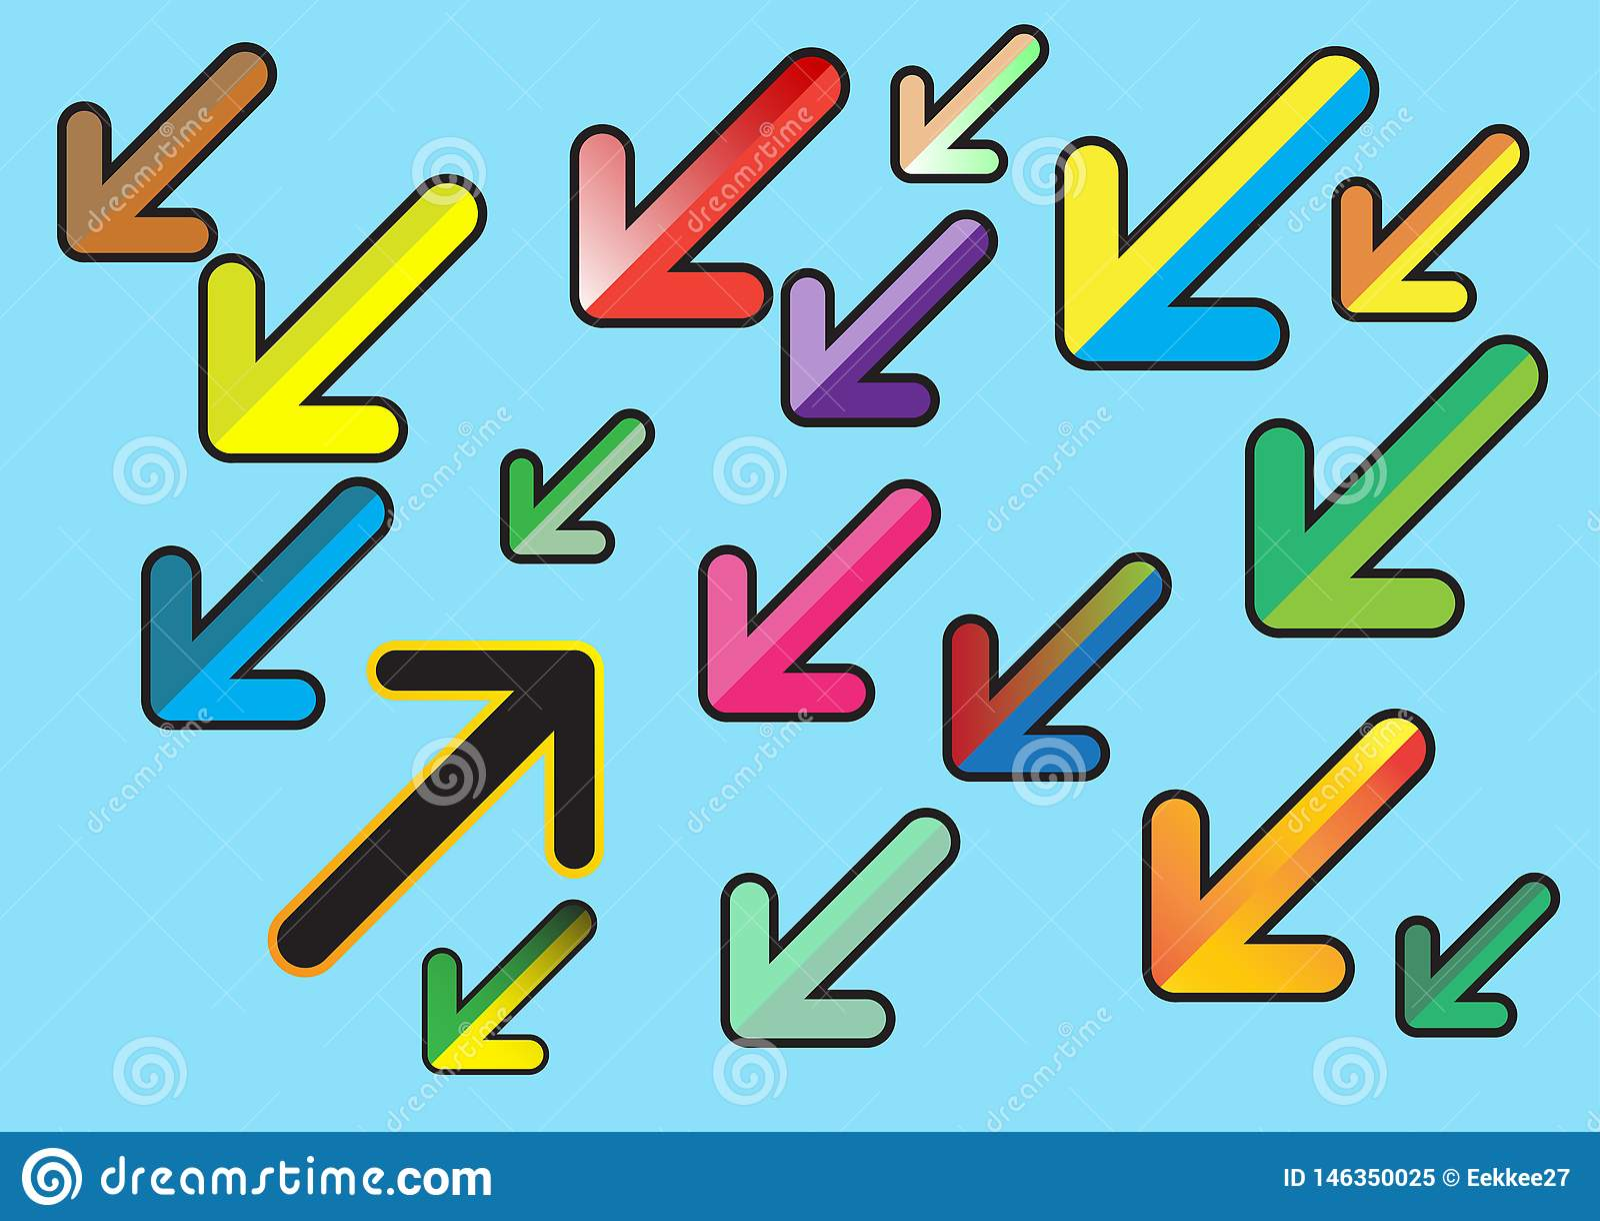 Flache Entwurfsart der bunten Pfeile Vektor Abbildung